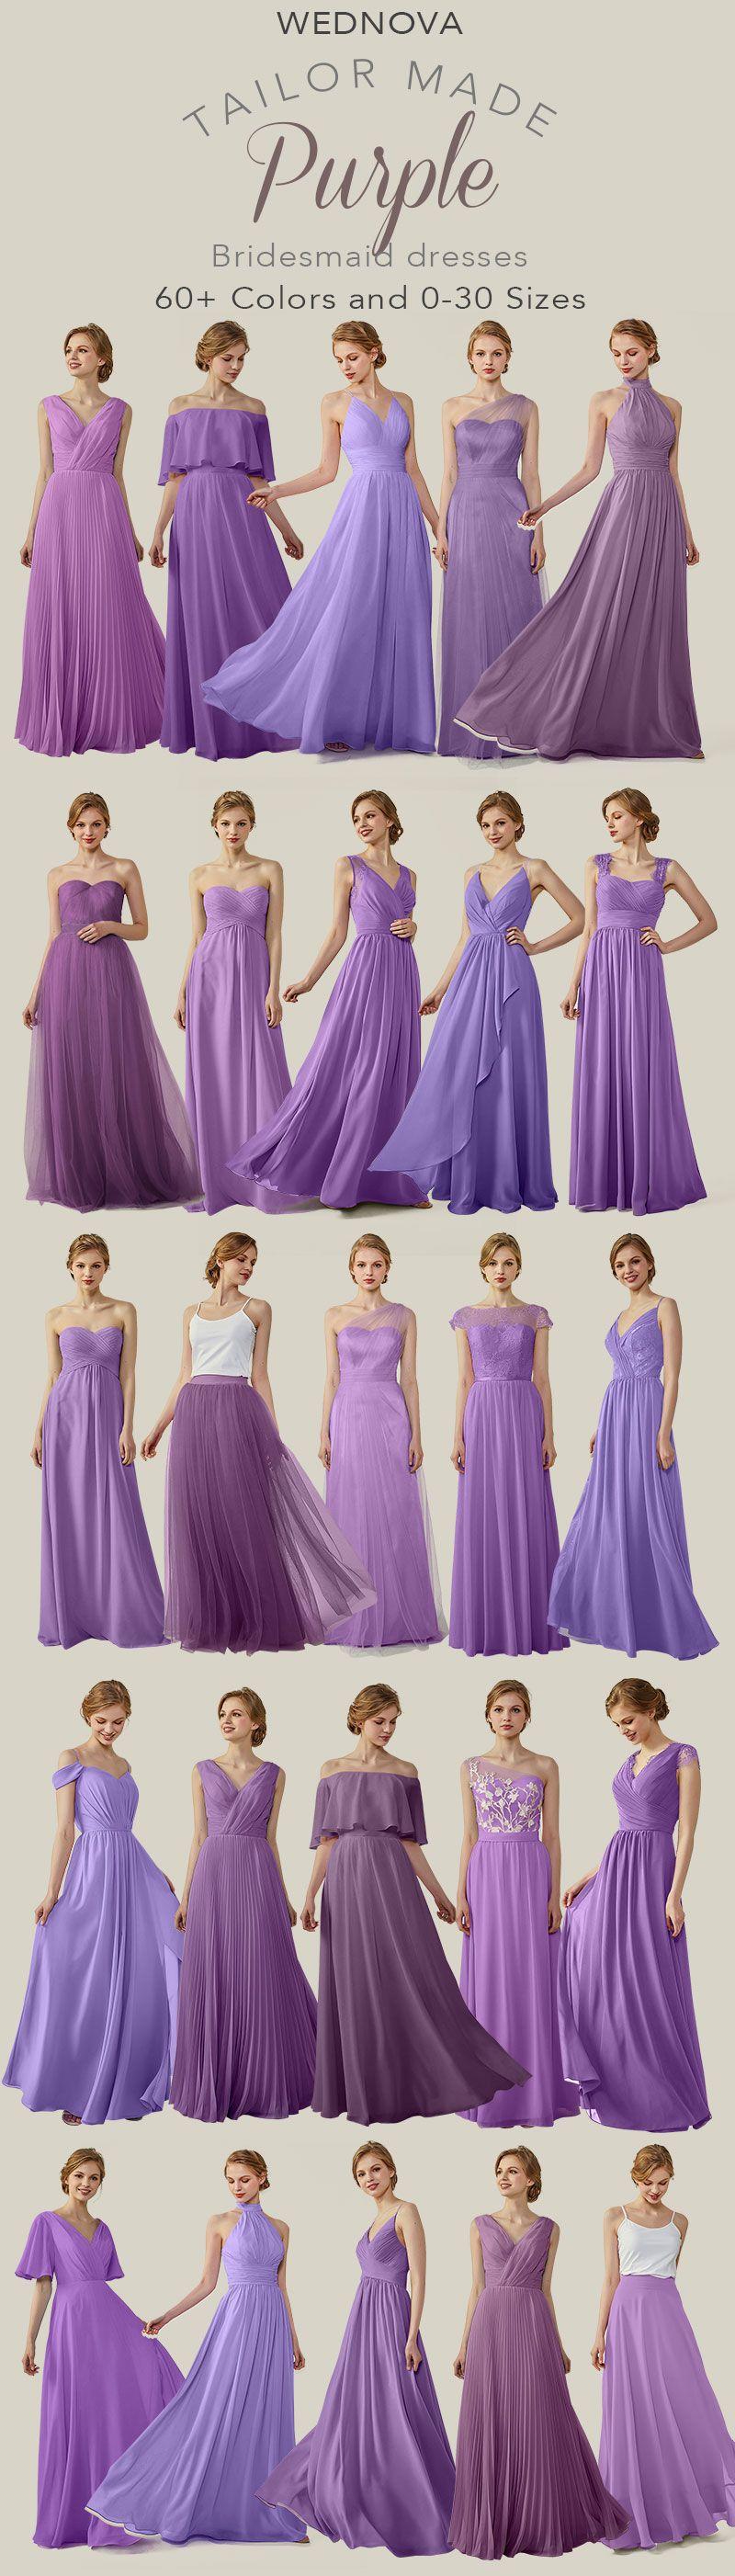 2018 fall color trendy bridesmaid dresses ombre purple